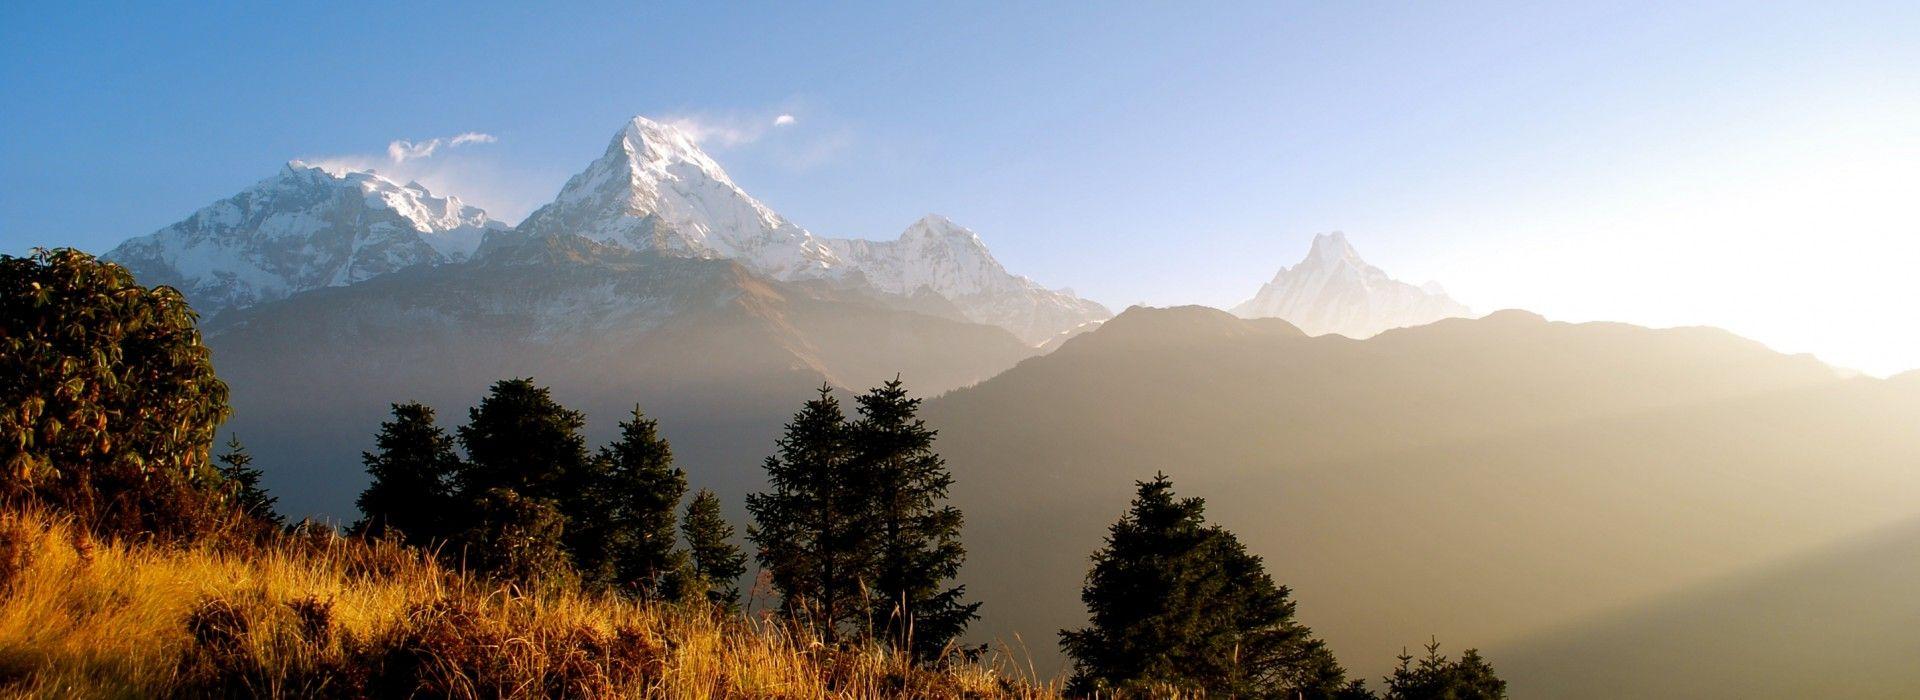 Zip lining Tours in Nepal